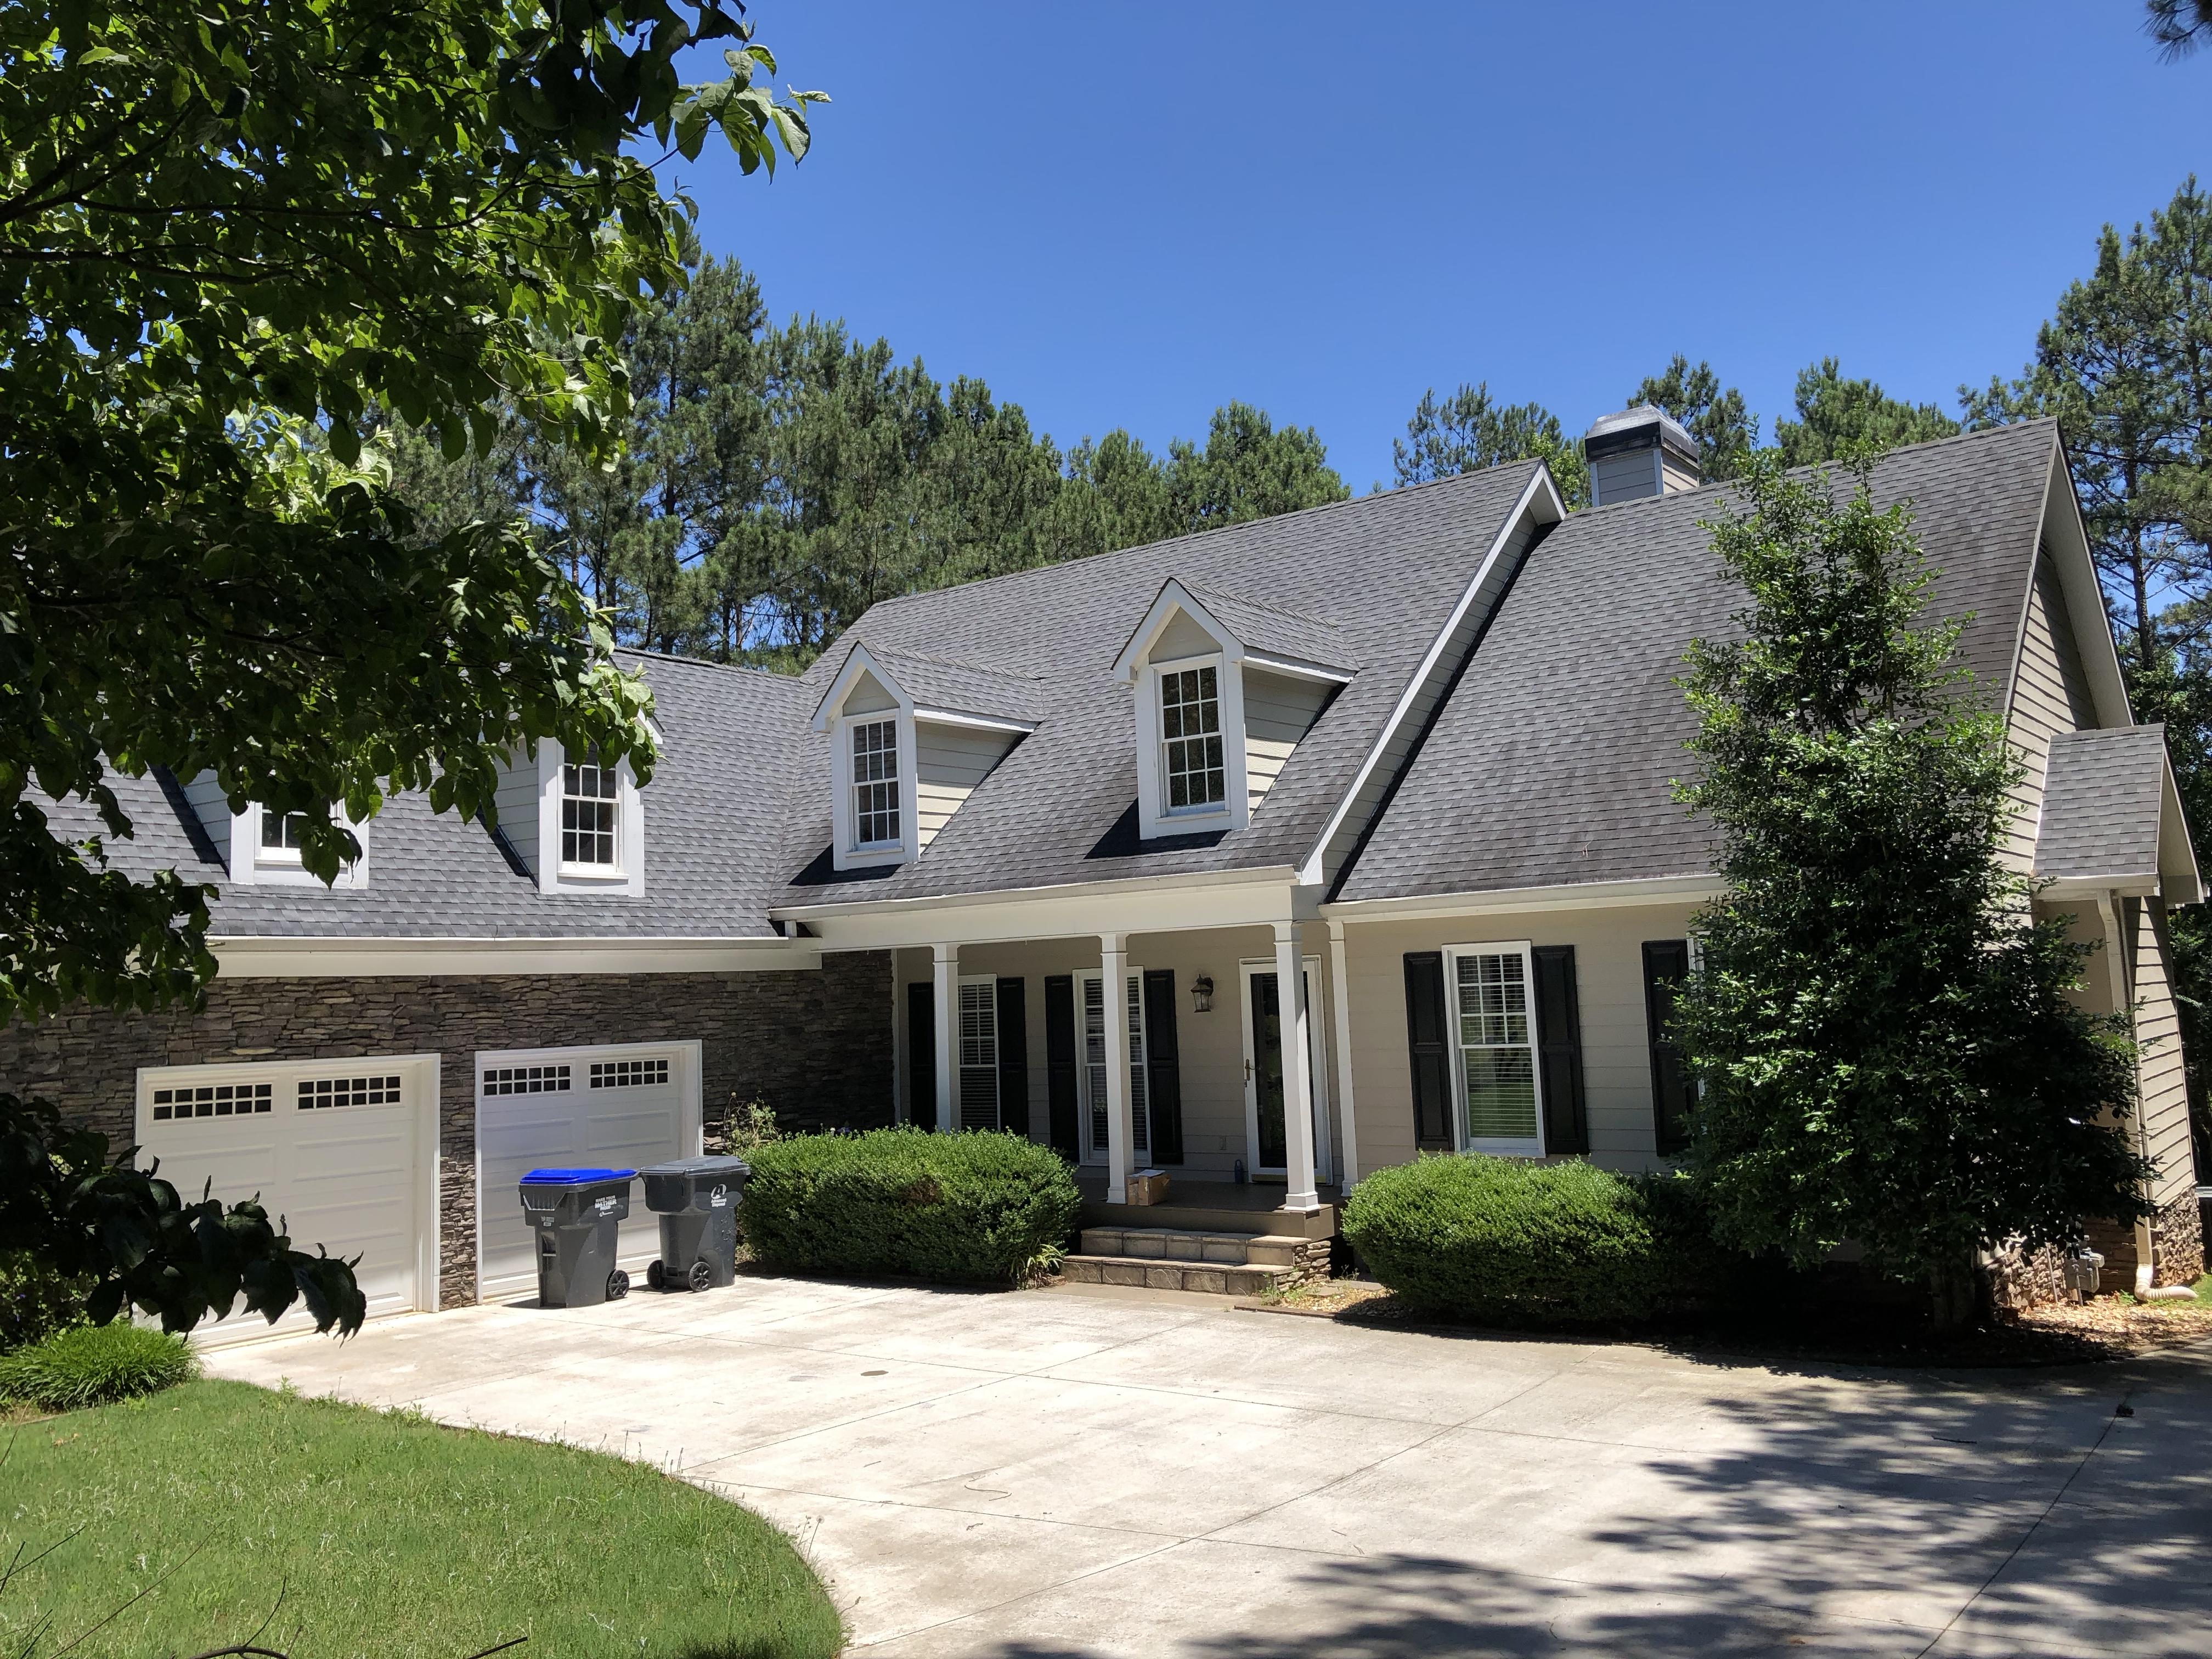 Photo of 4660 Hamptons Drive, Alpharetta, GA, 30004